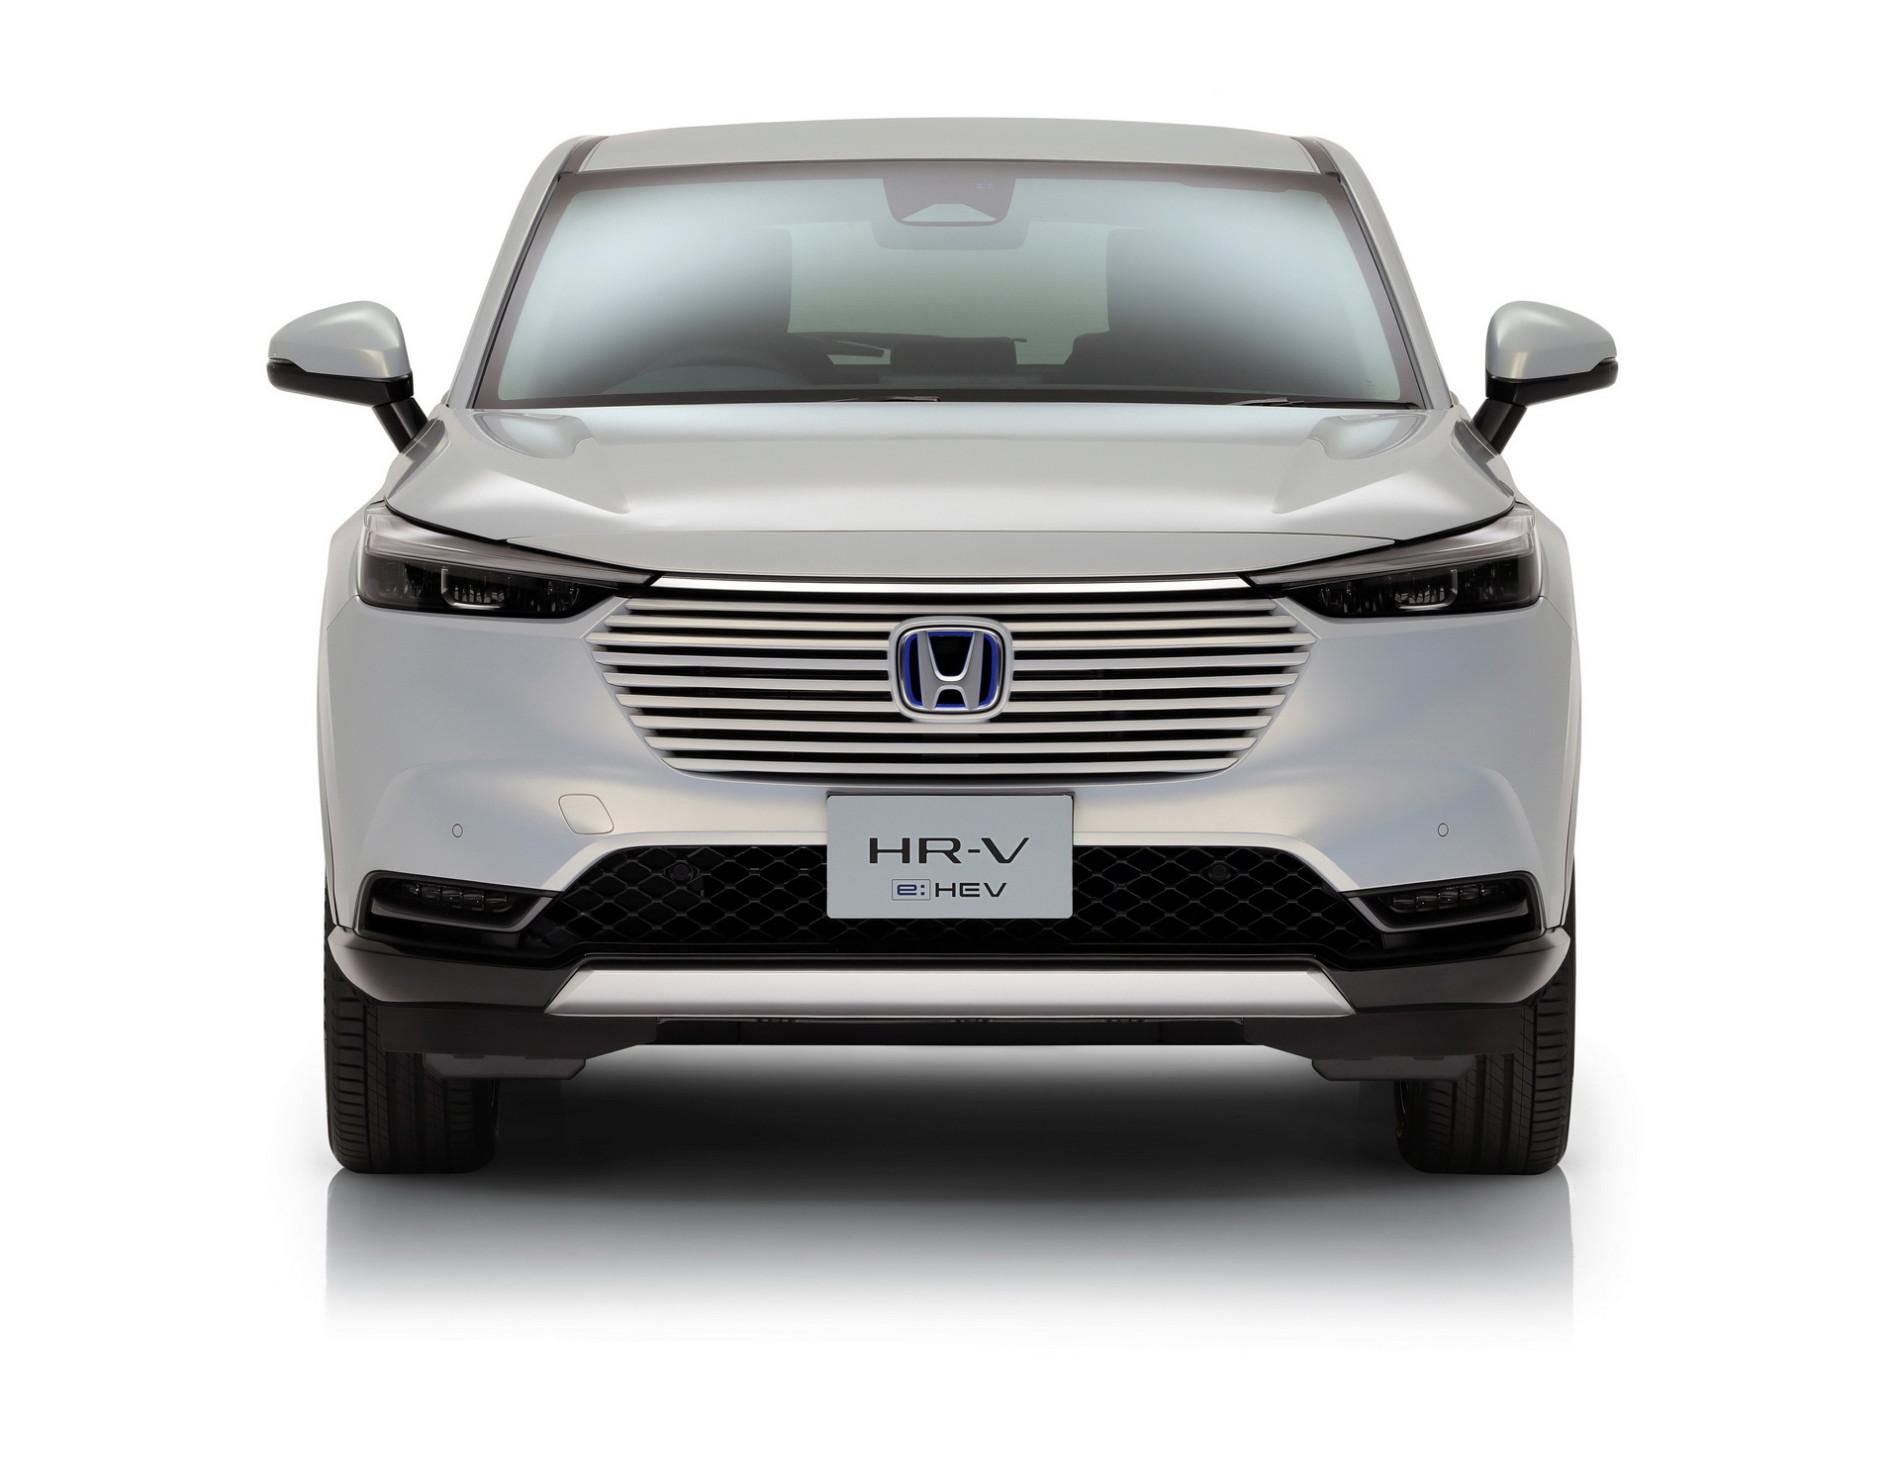 Honda HR-V - Honda HR-V